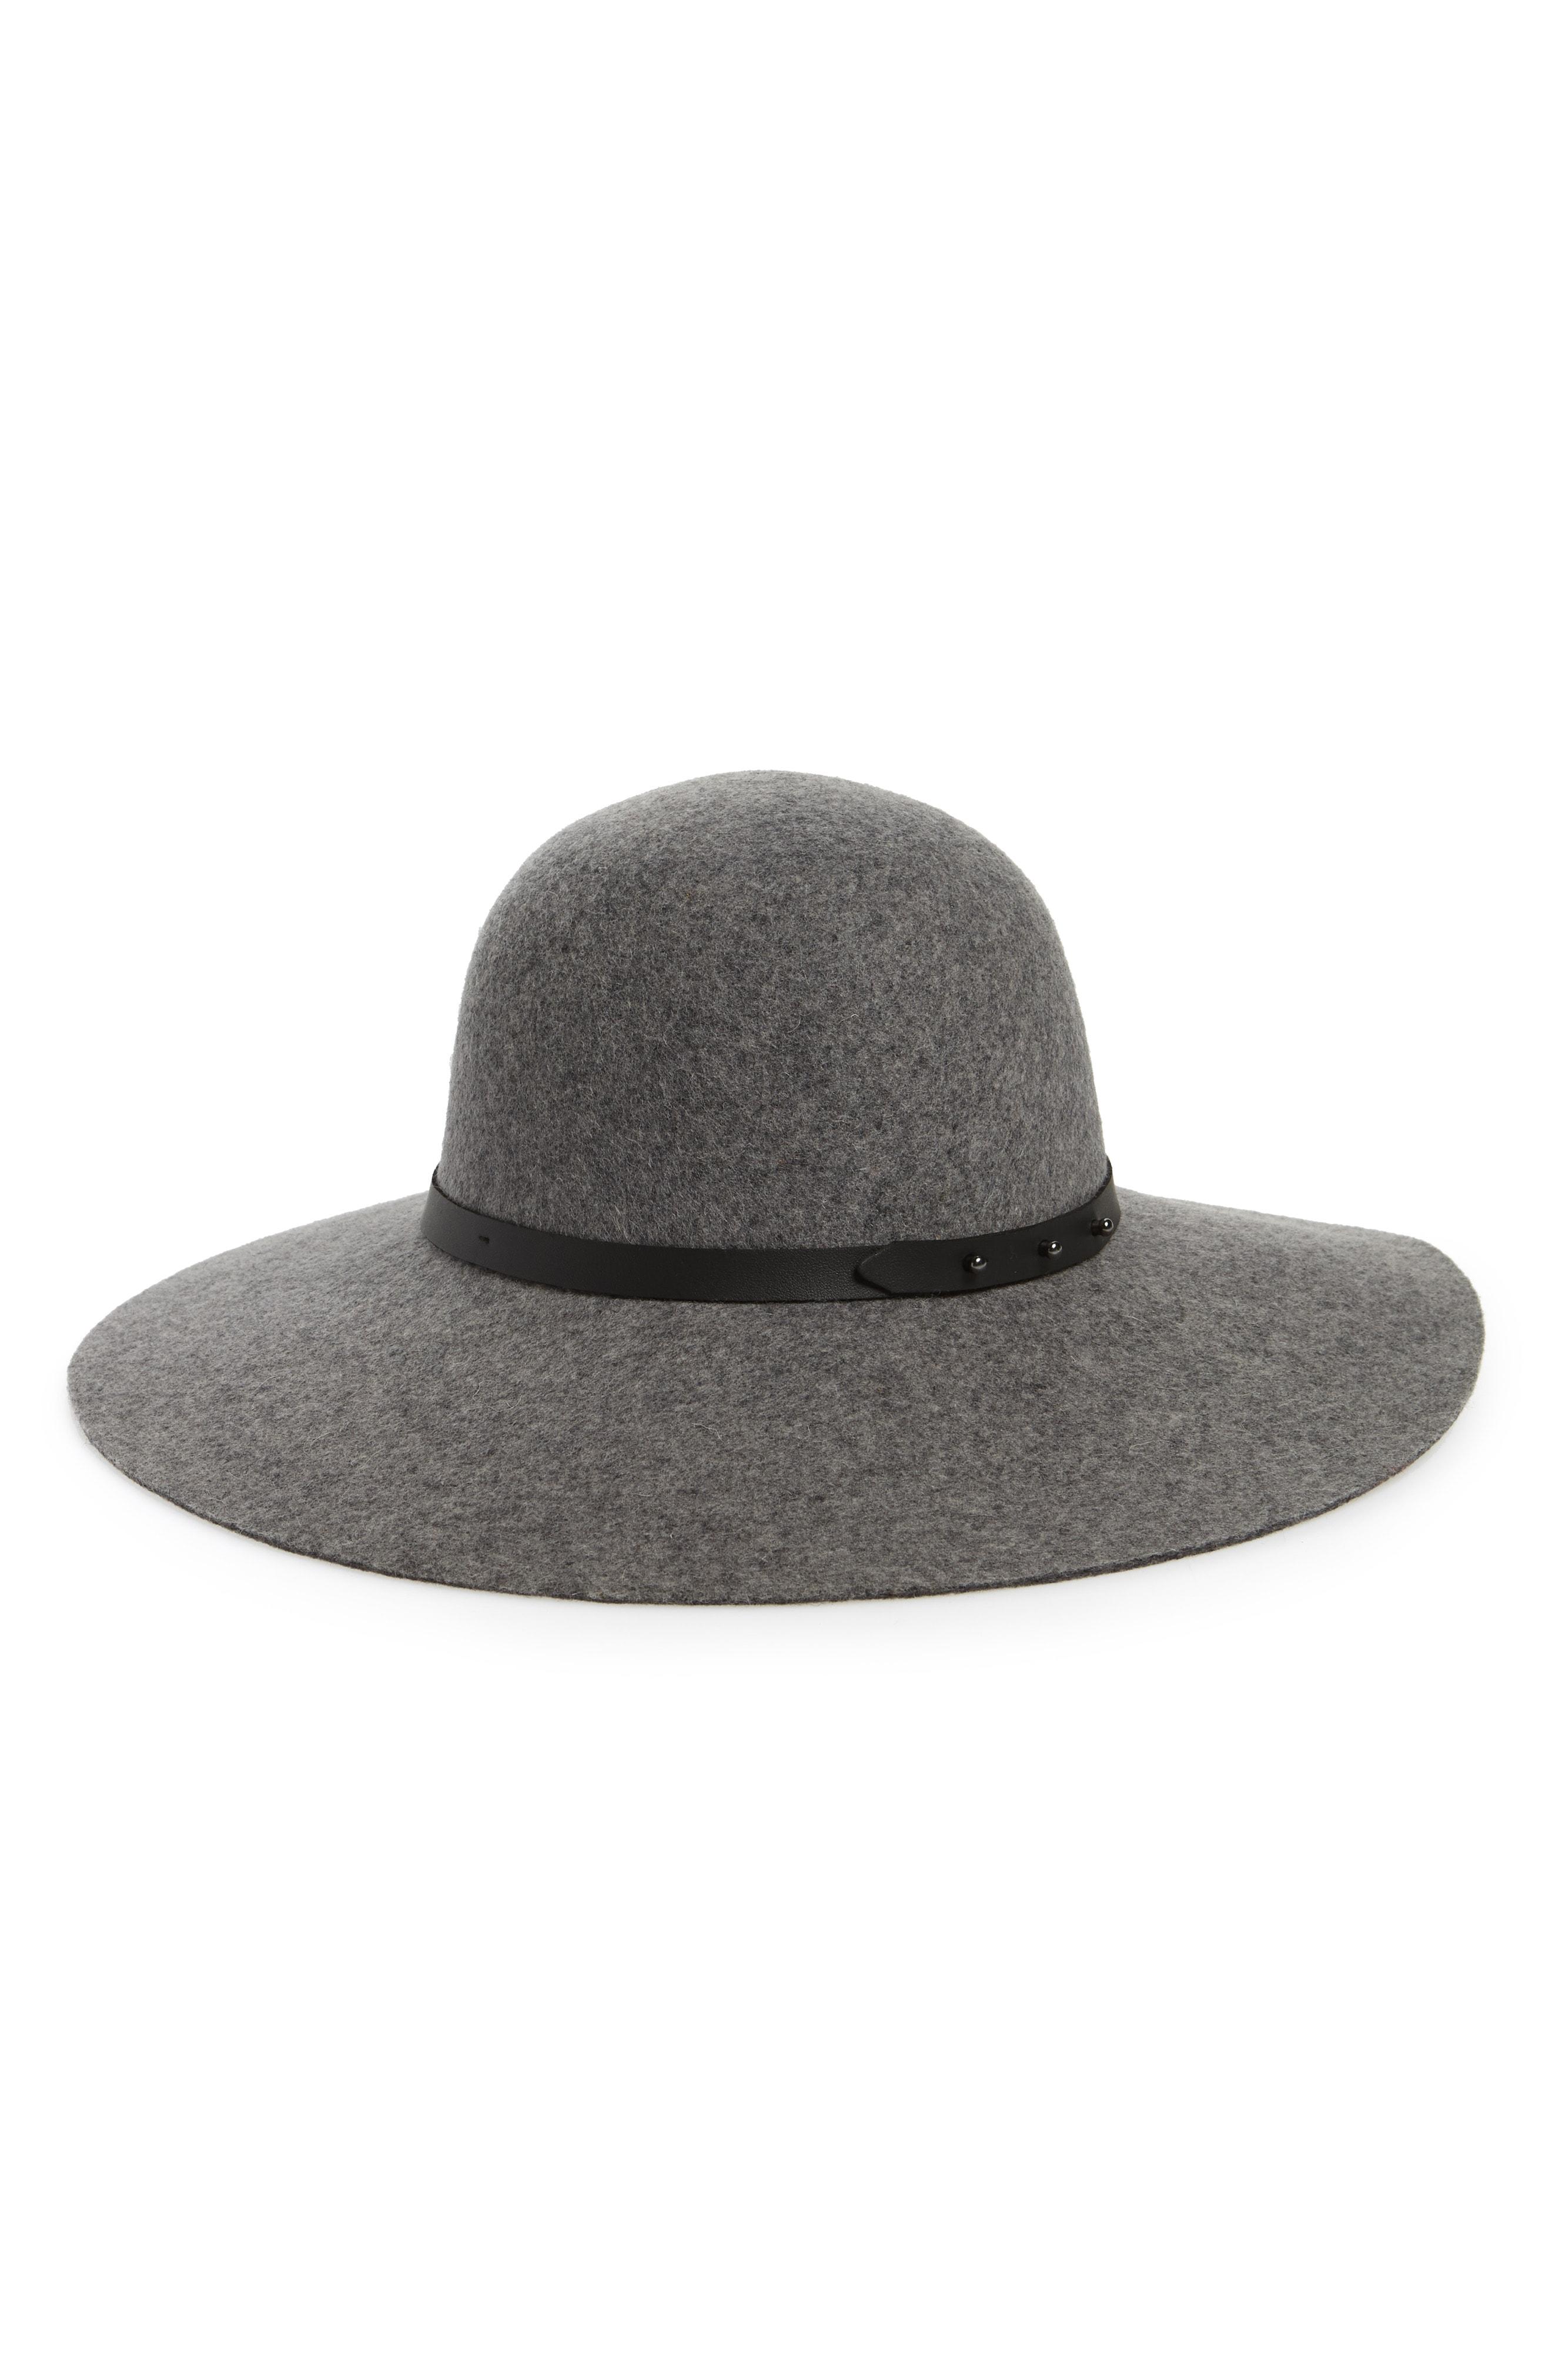 Women's Floppy Hats   Nordstrom